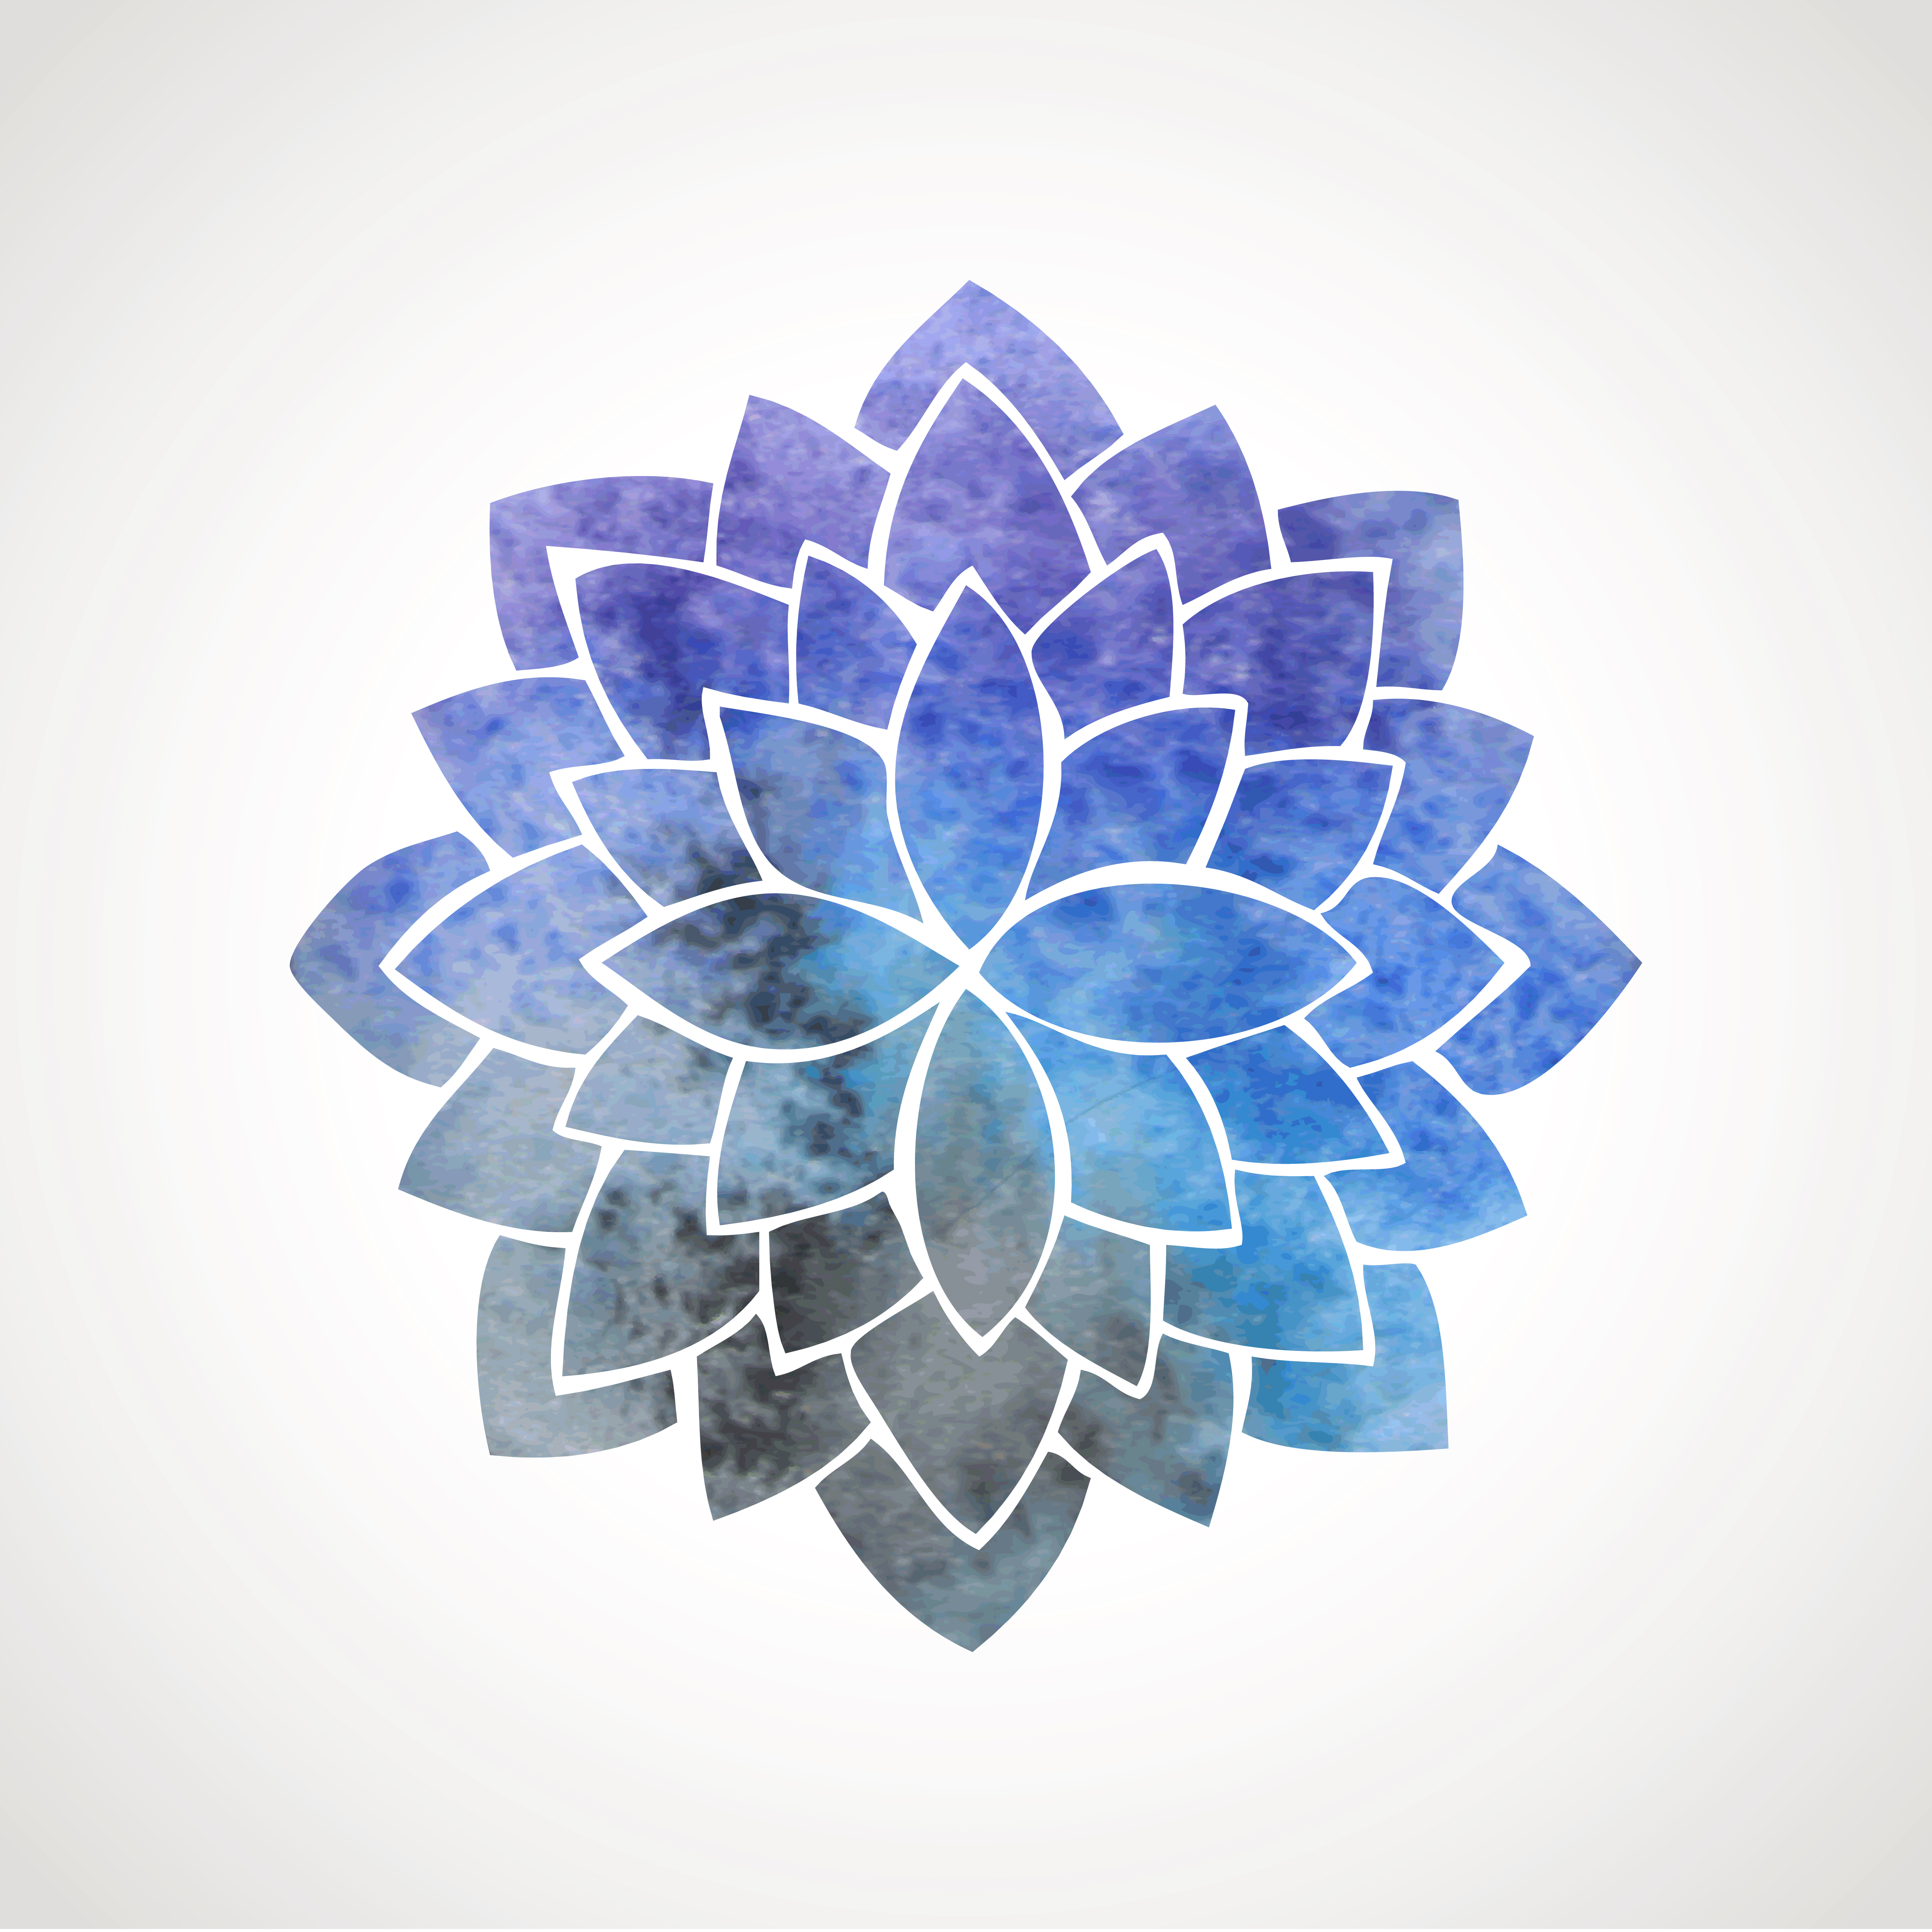 Watercolor Lotus Flower With Space Background Guru Circus